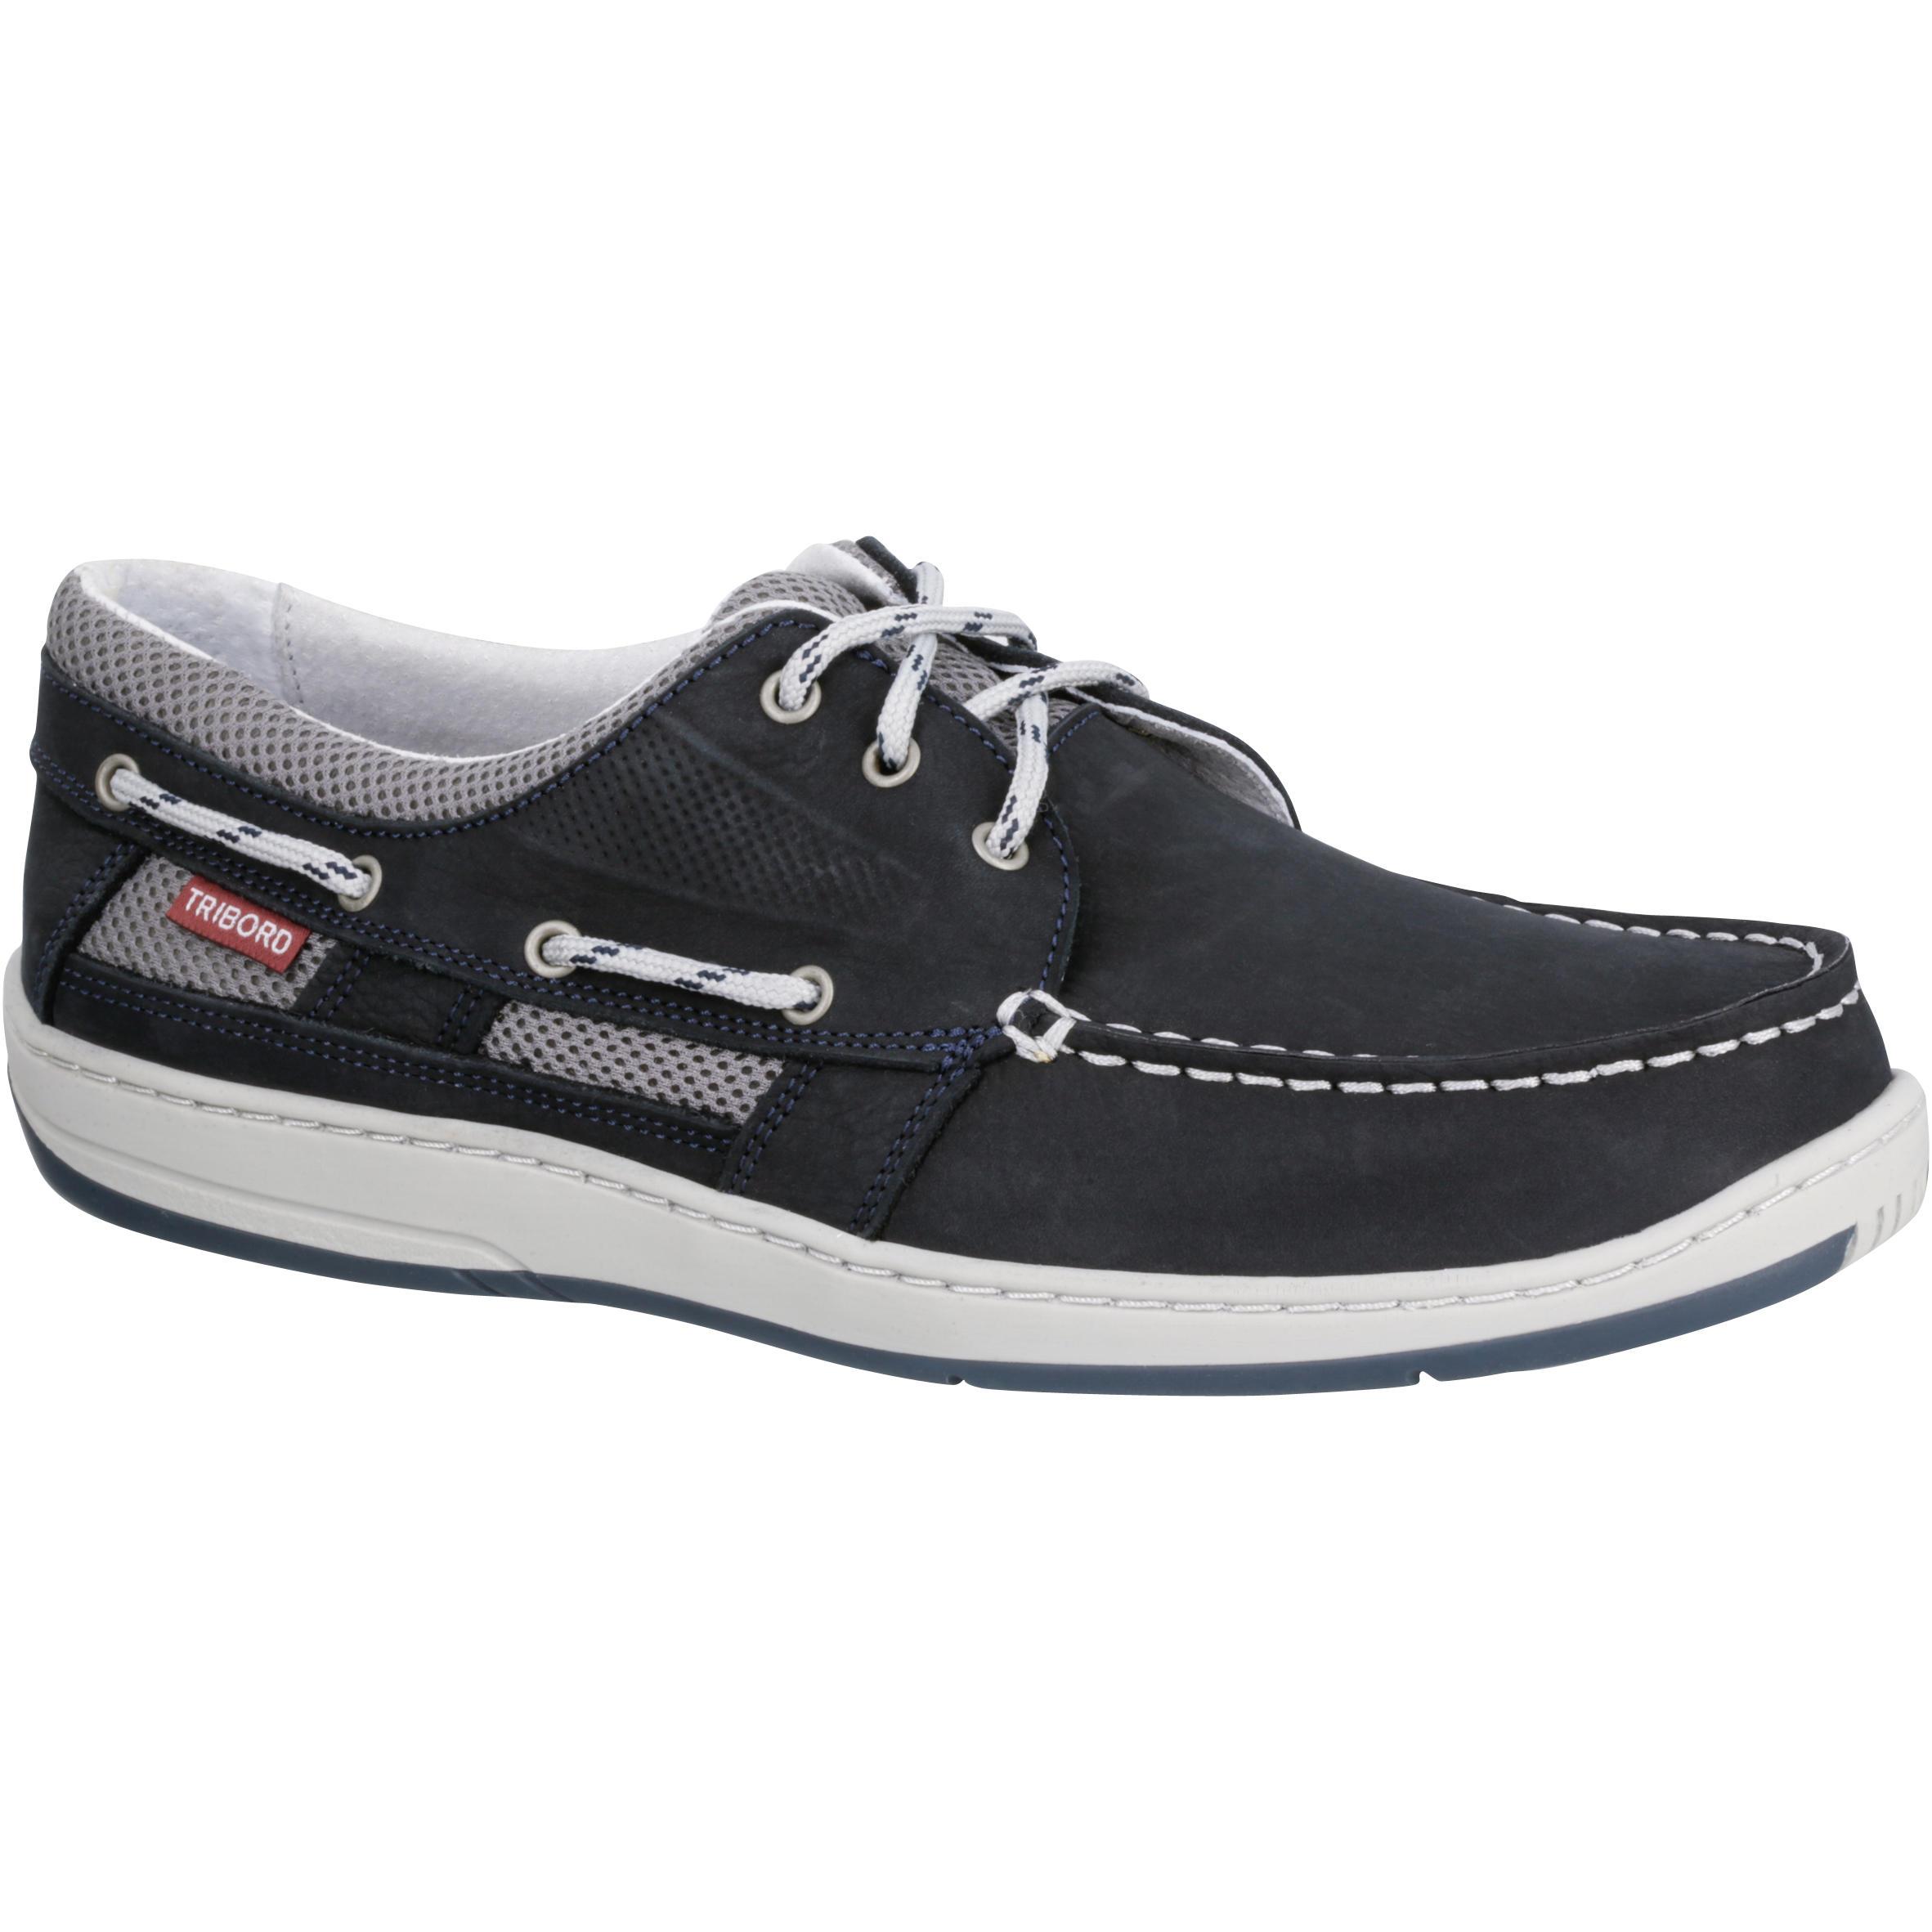 Chaussures bateau homme CLIPPER Bleu - Tribord